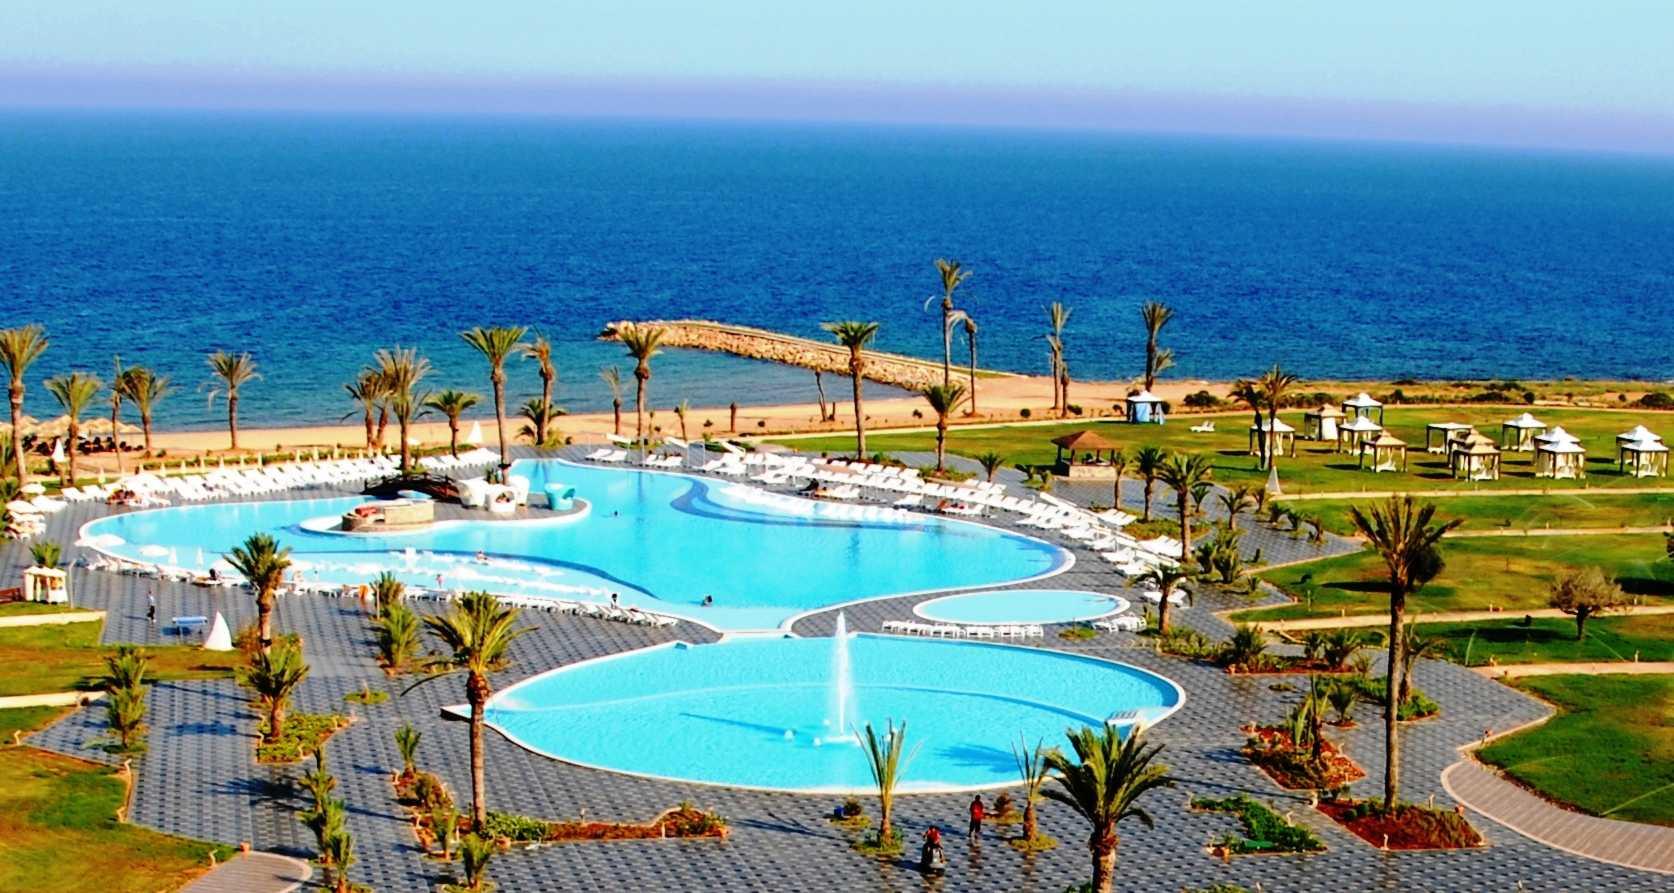 Noahs ark deluxe hotel casino cyprus commerce casino poker tournament review